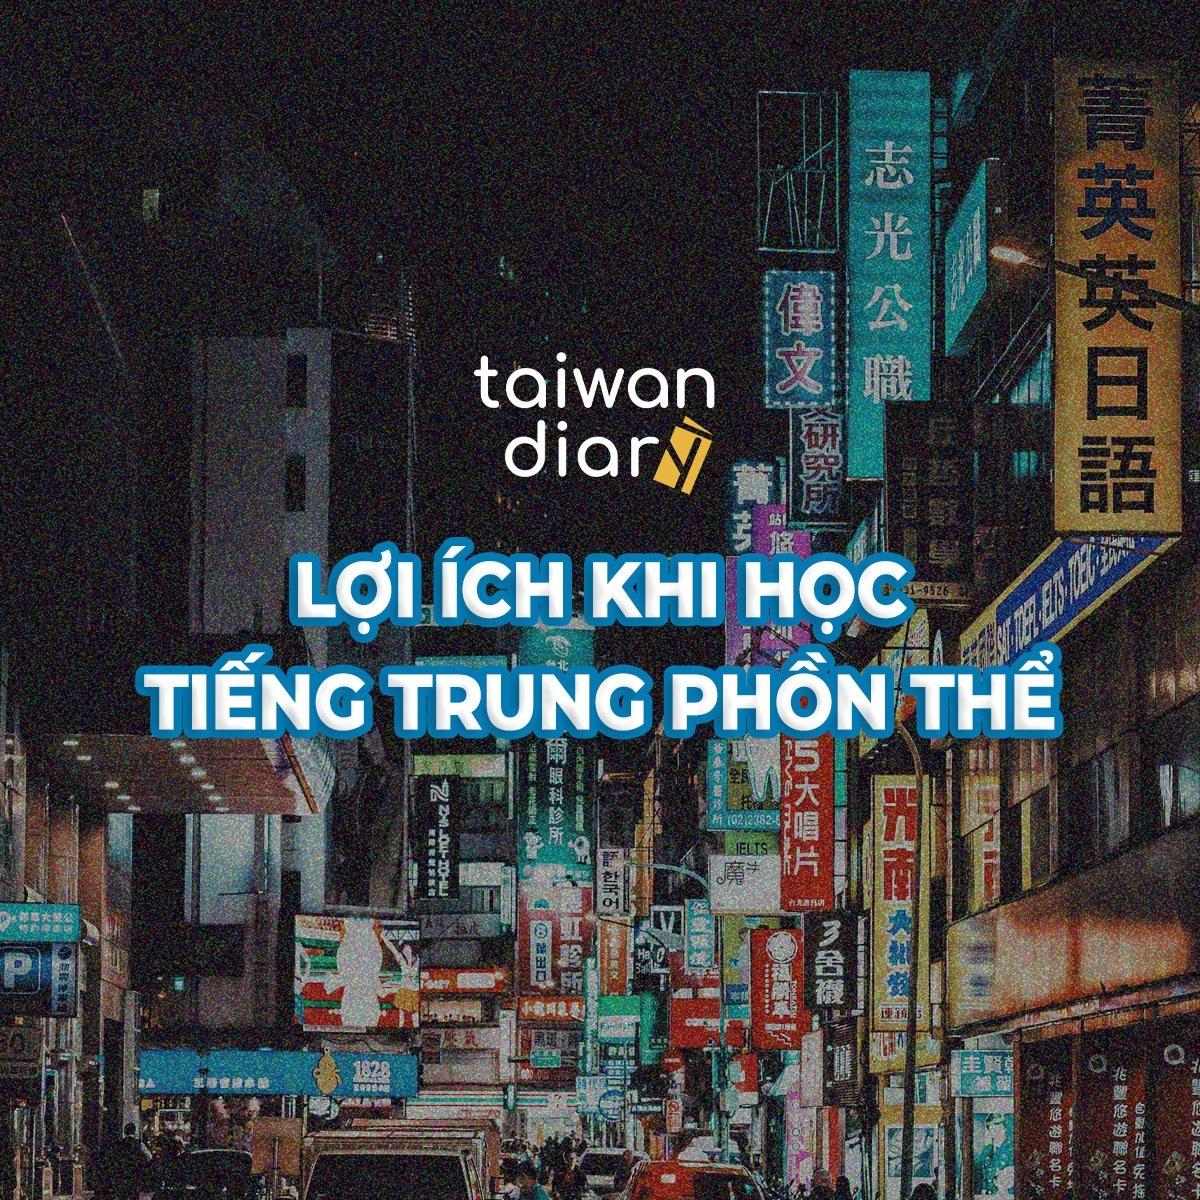 tieng trung phon the